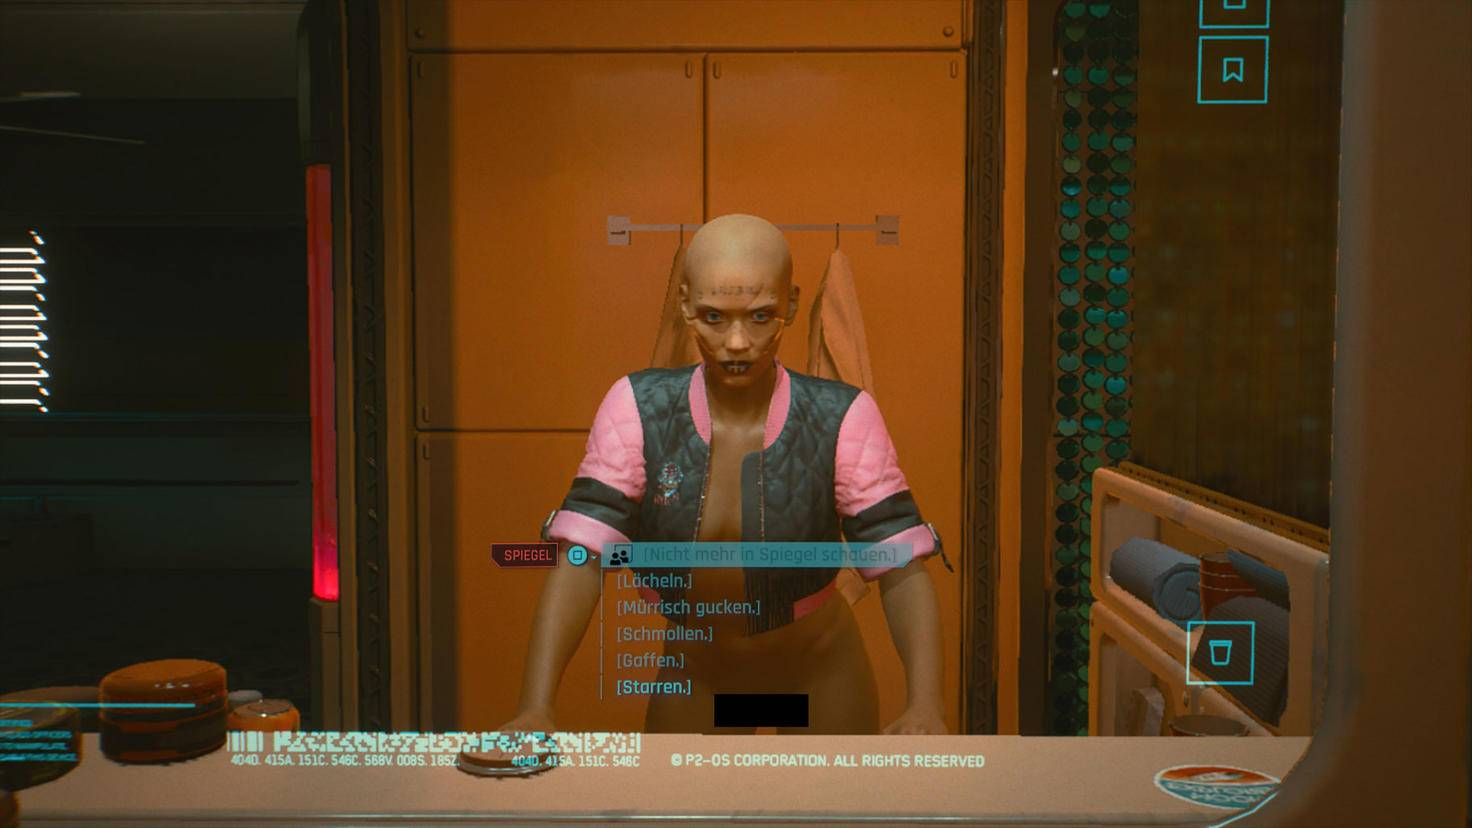 cyberpunk-2077-ps5-screenshot-03